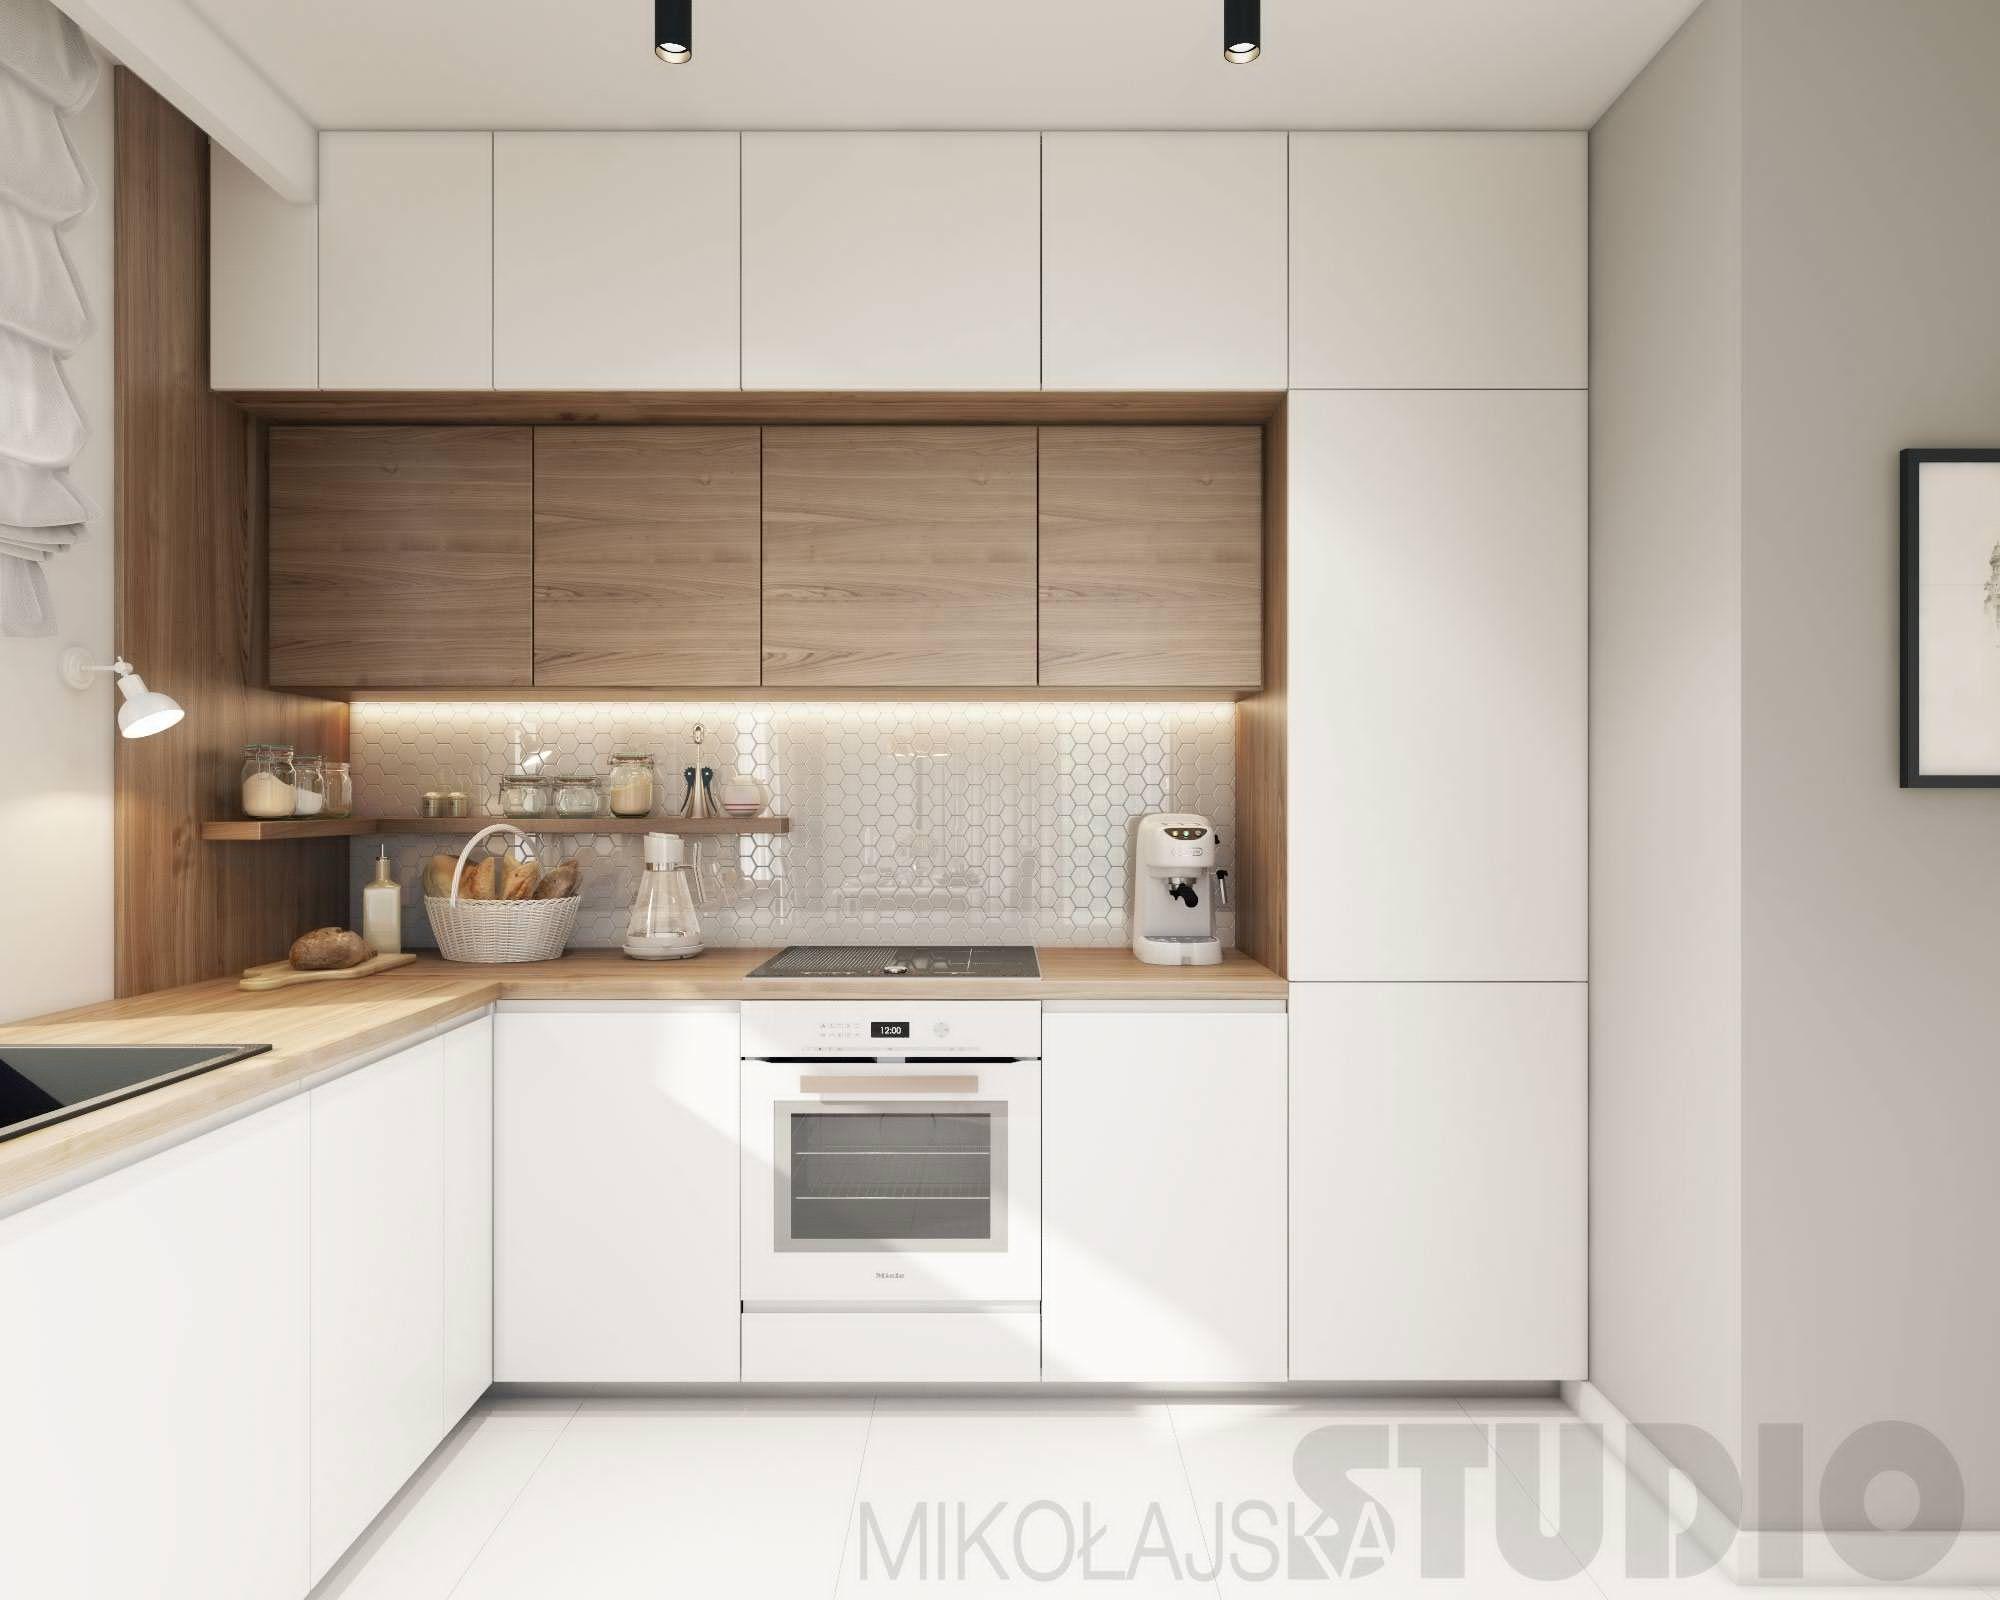 L Mutfak Dolabı Modelleri | Mutfak | Pinterest | Küche